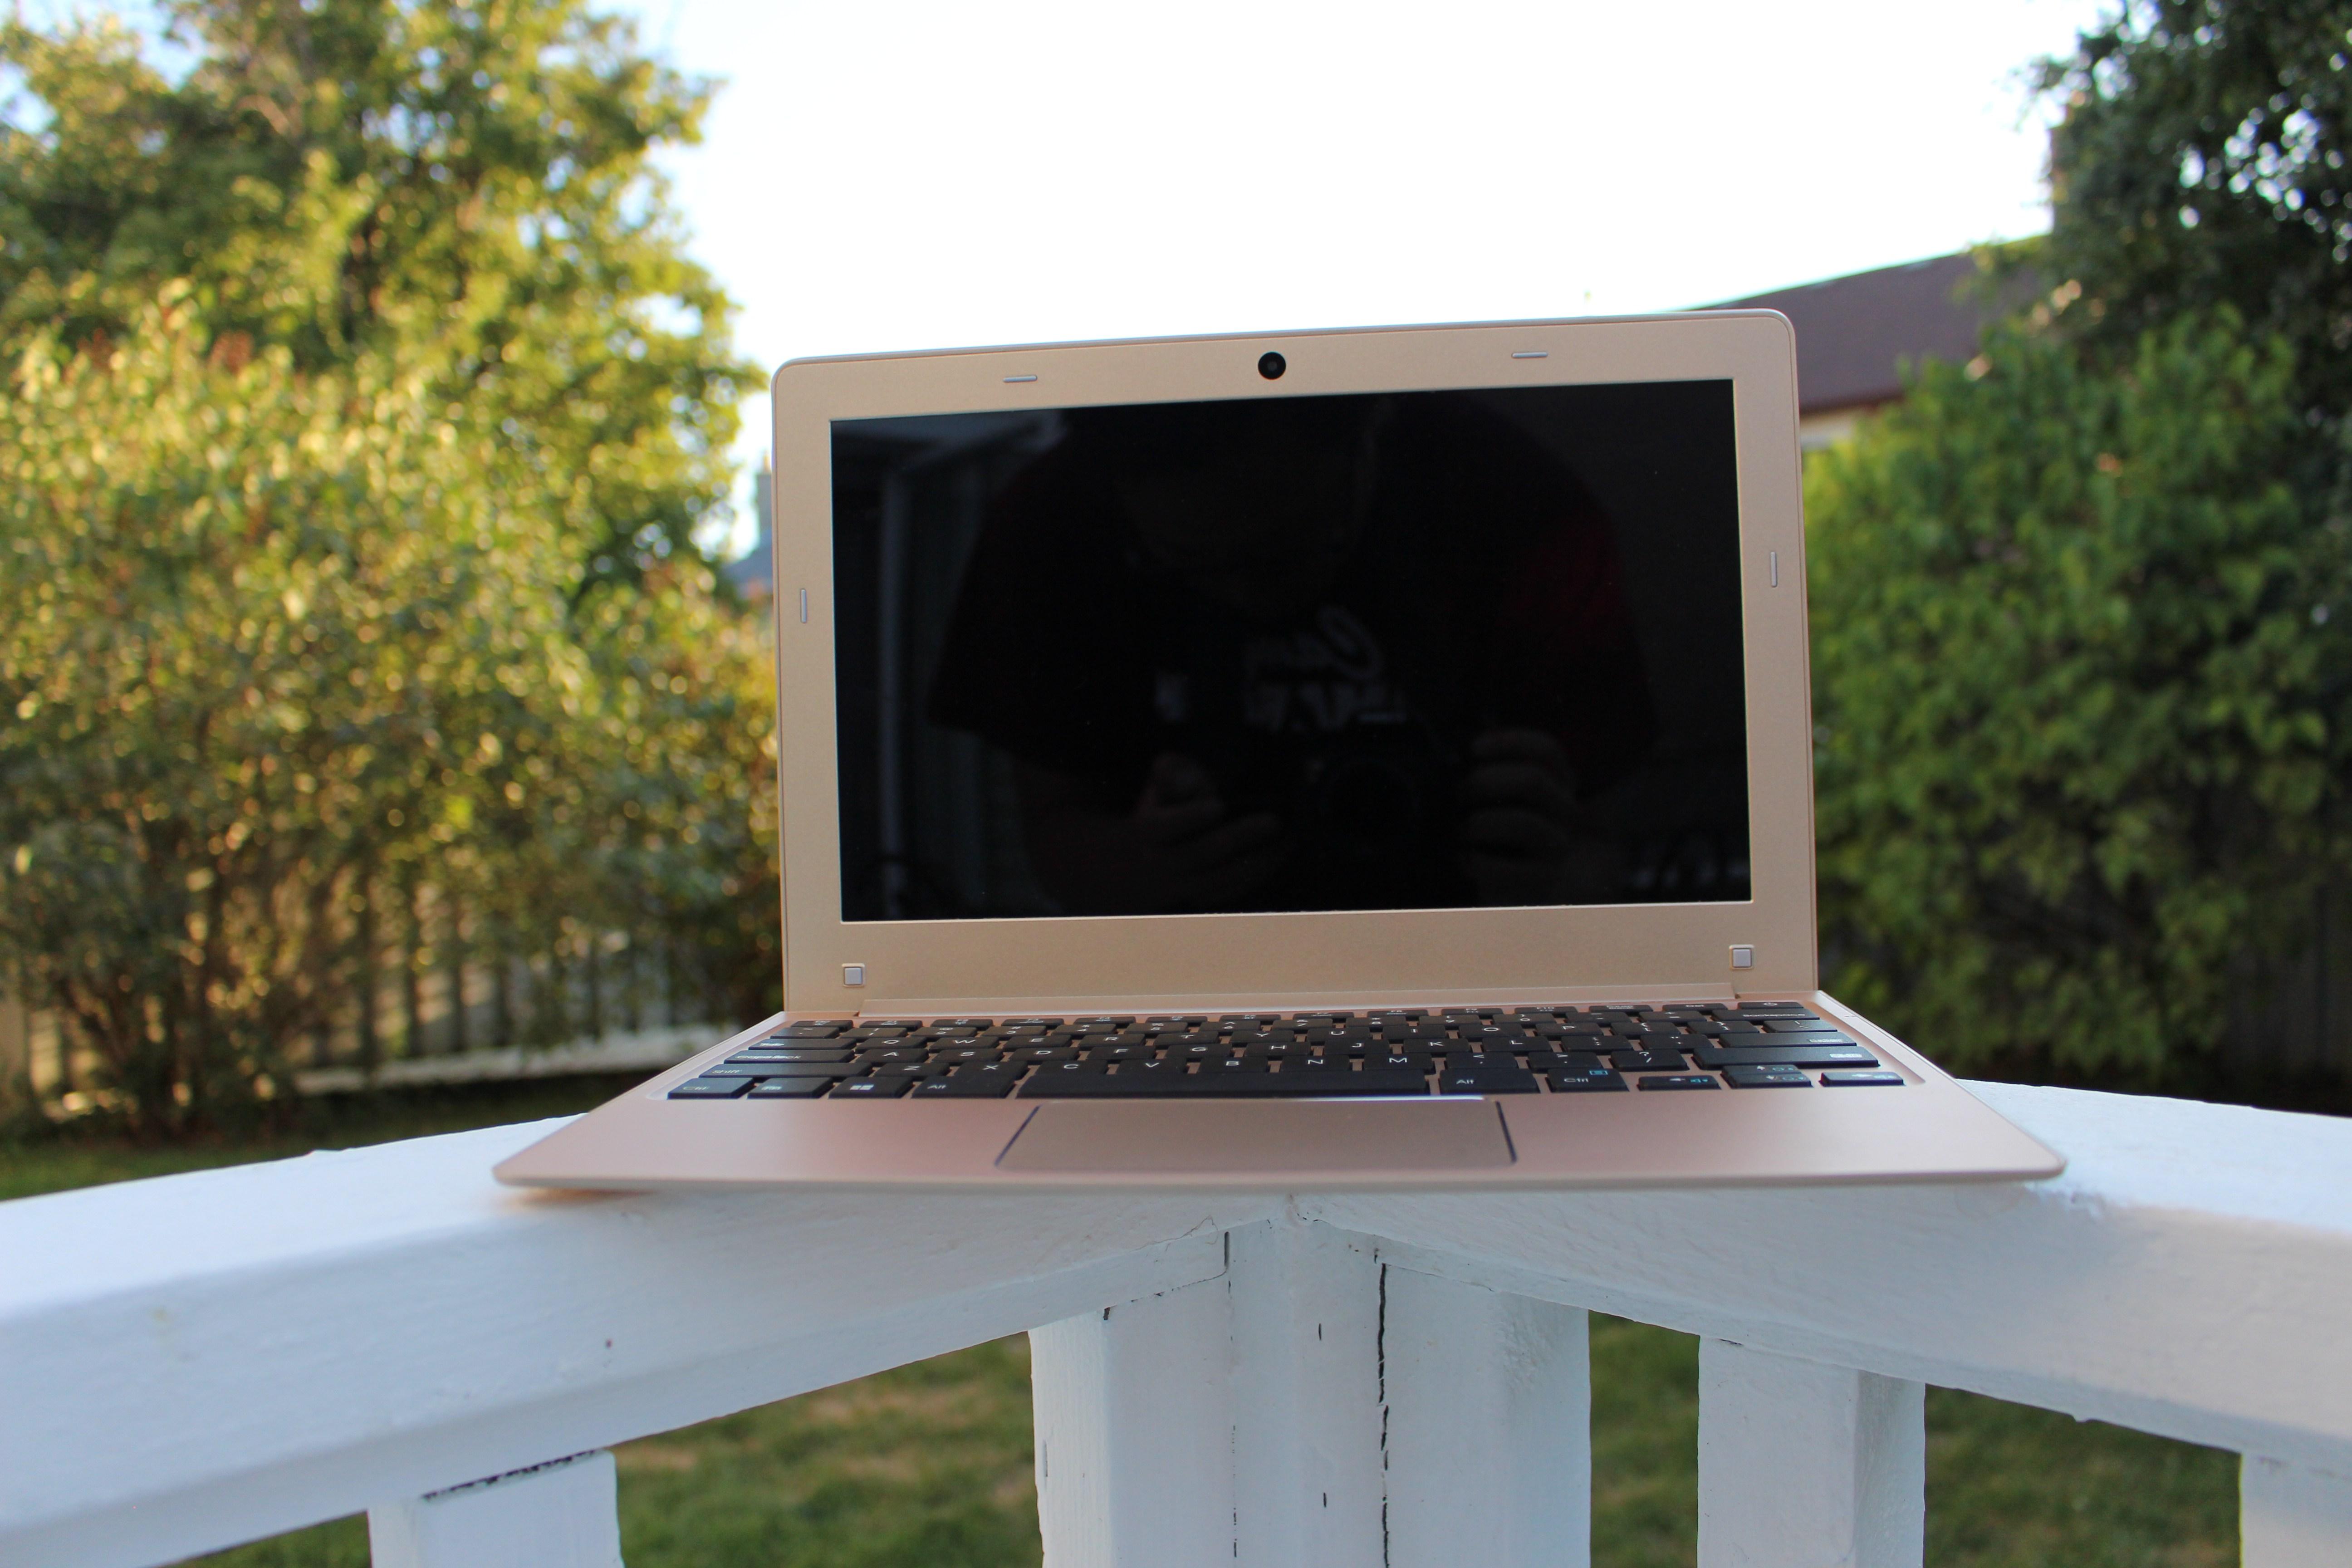 Jumper EZBook Air Display